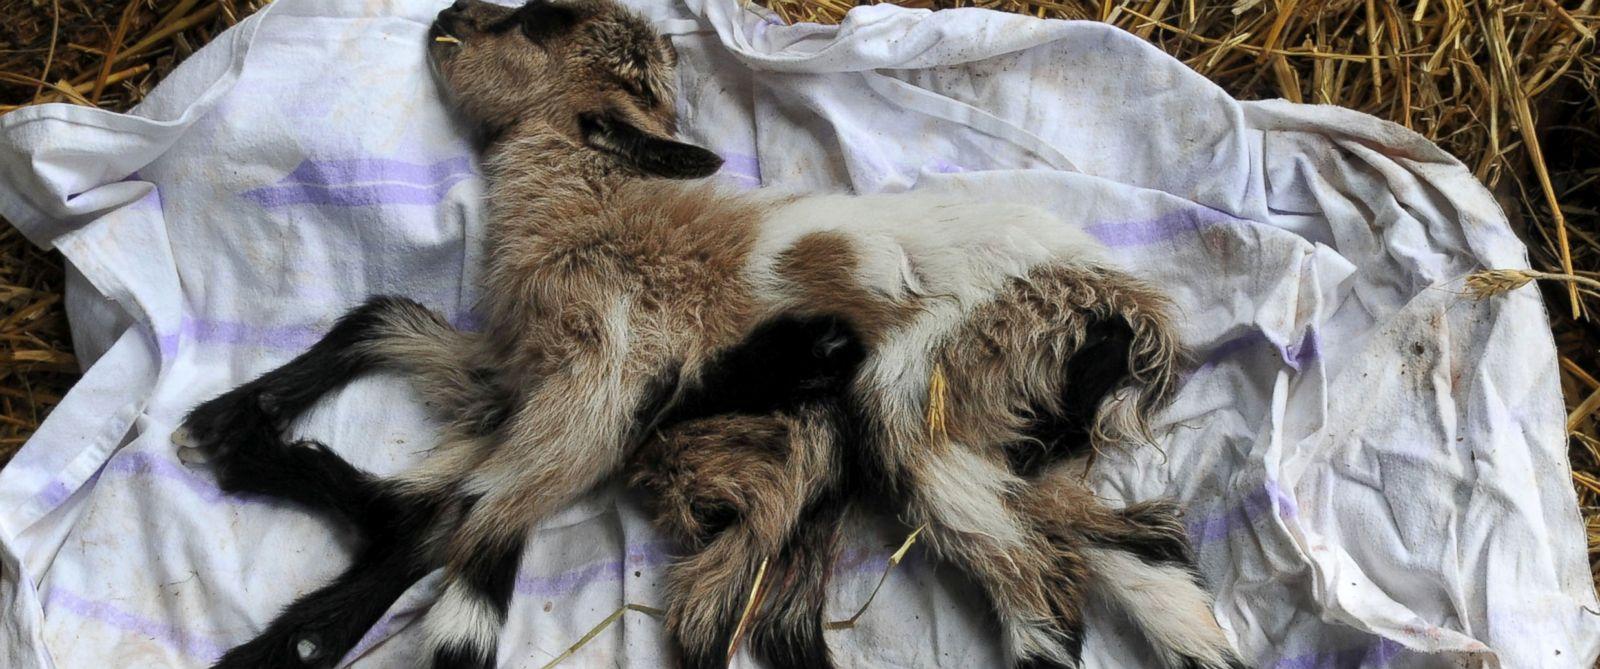 PHOTO: A goat with eight legs has been born on a farm in Kutjevo, Croatia.